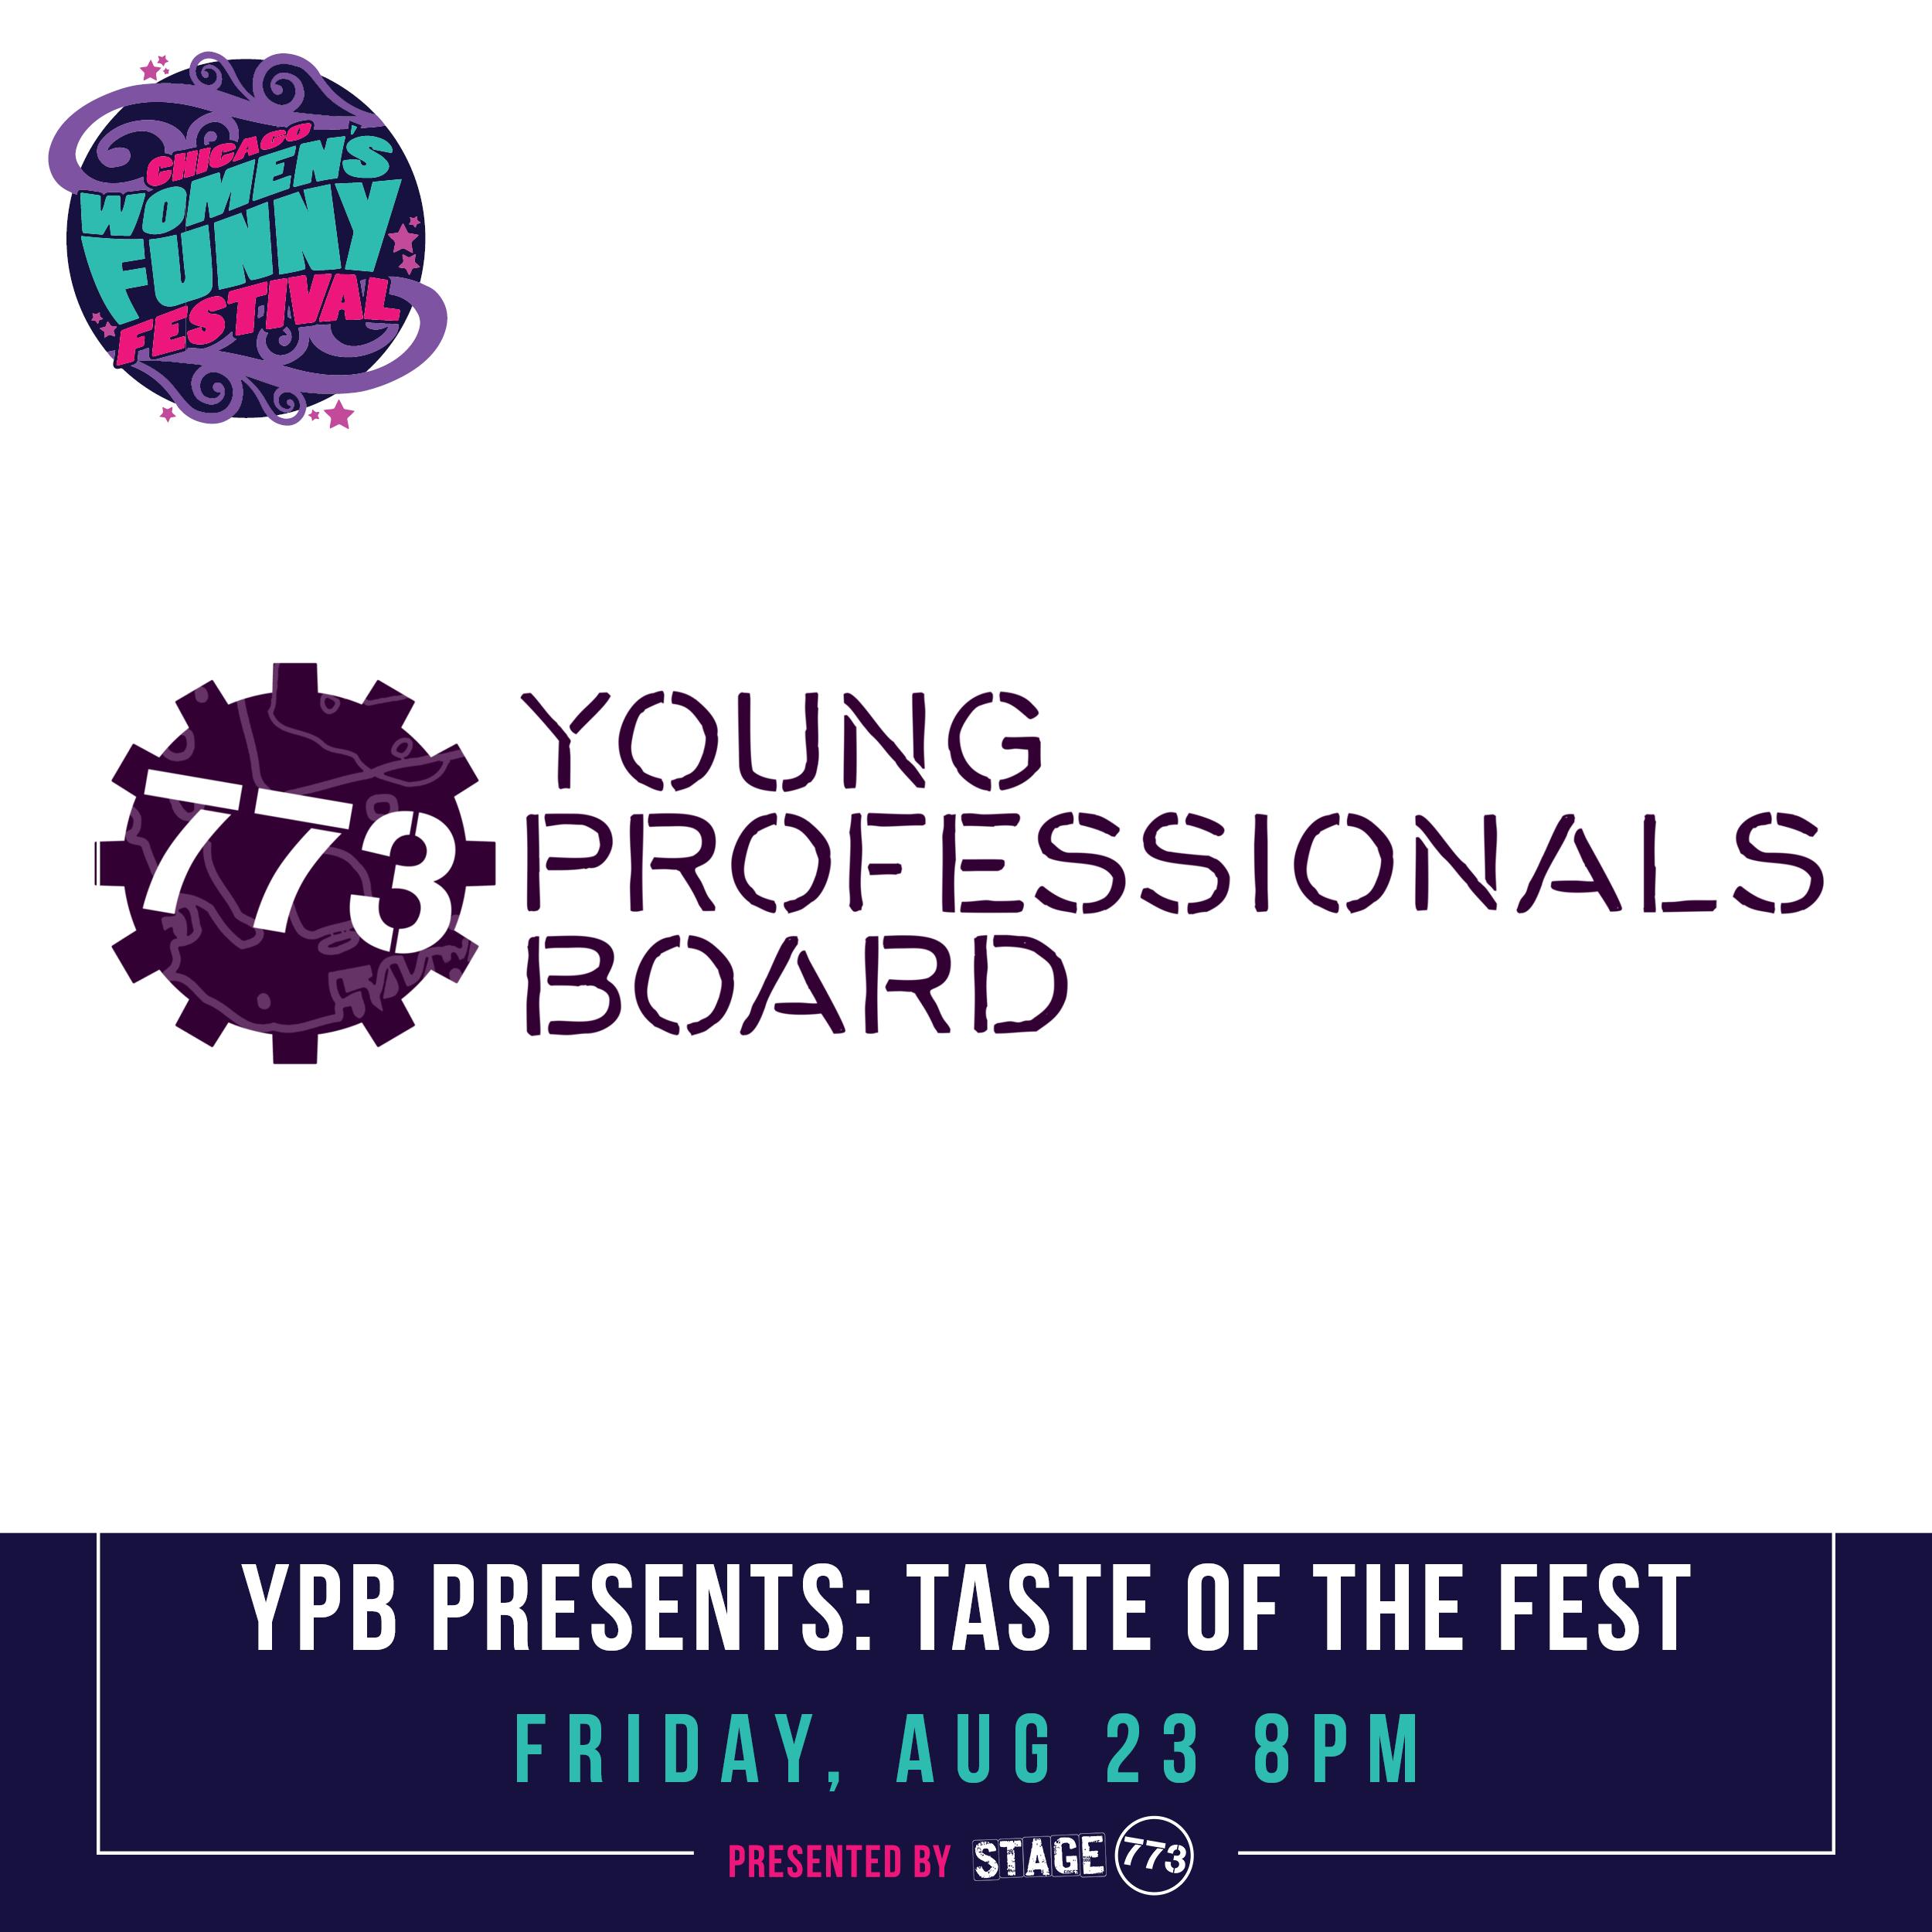 TasteoftheFest_Friday_8PM_CWFF20195.jpg